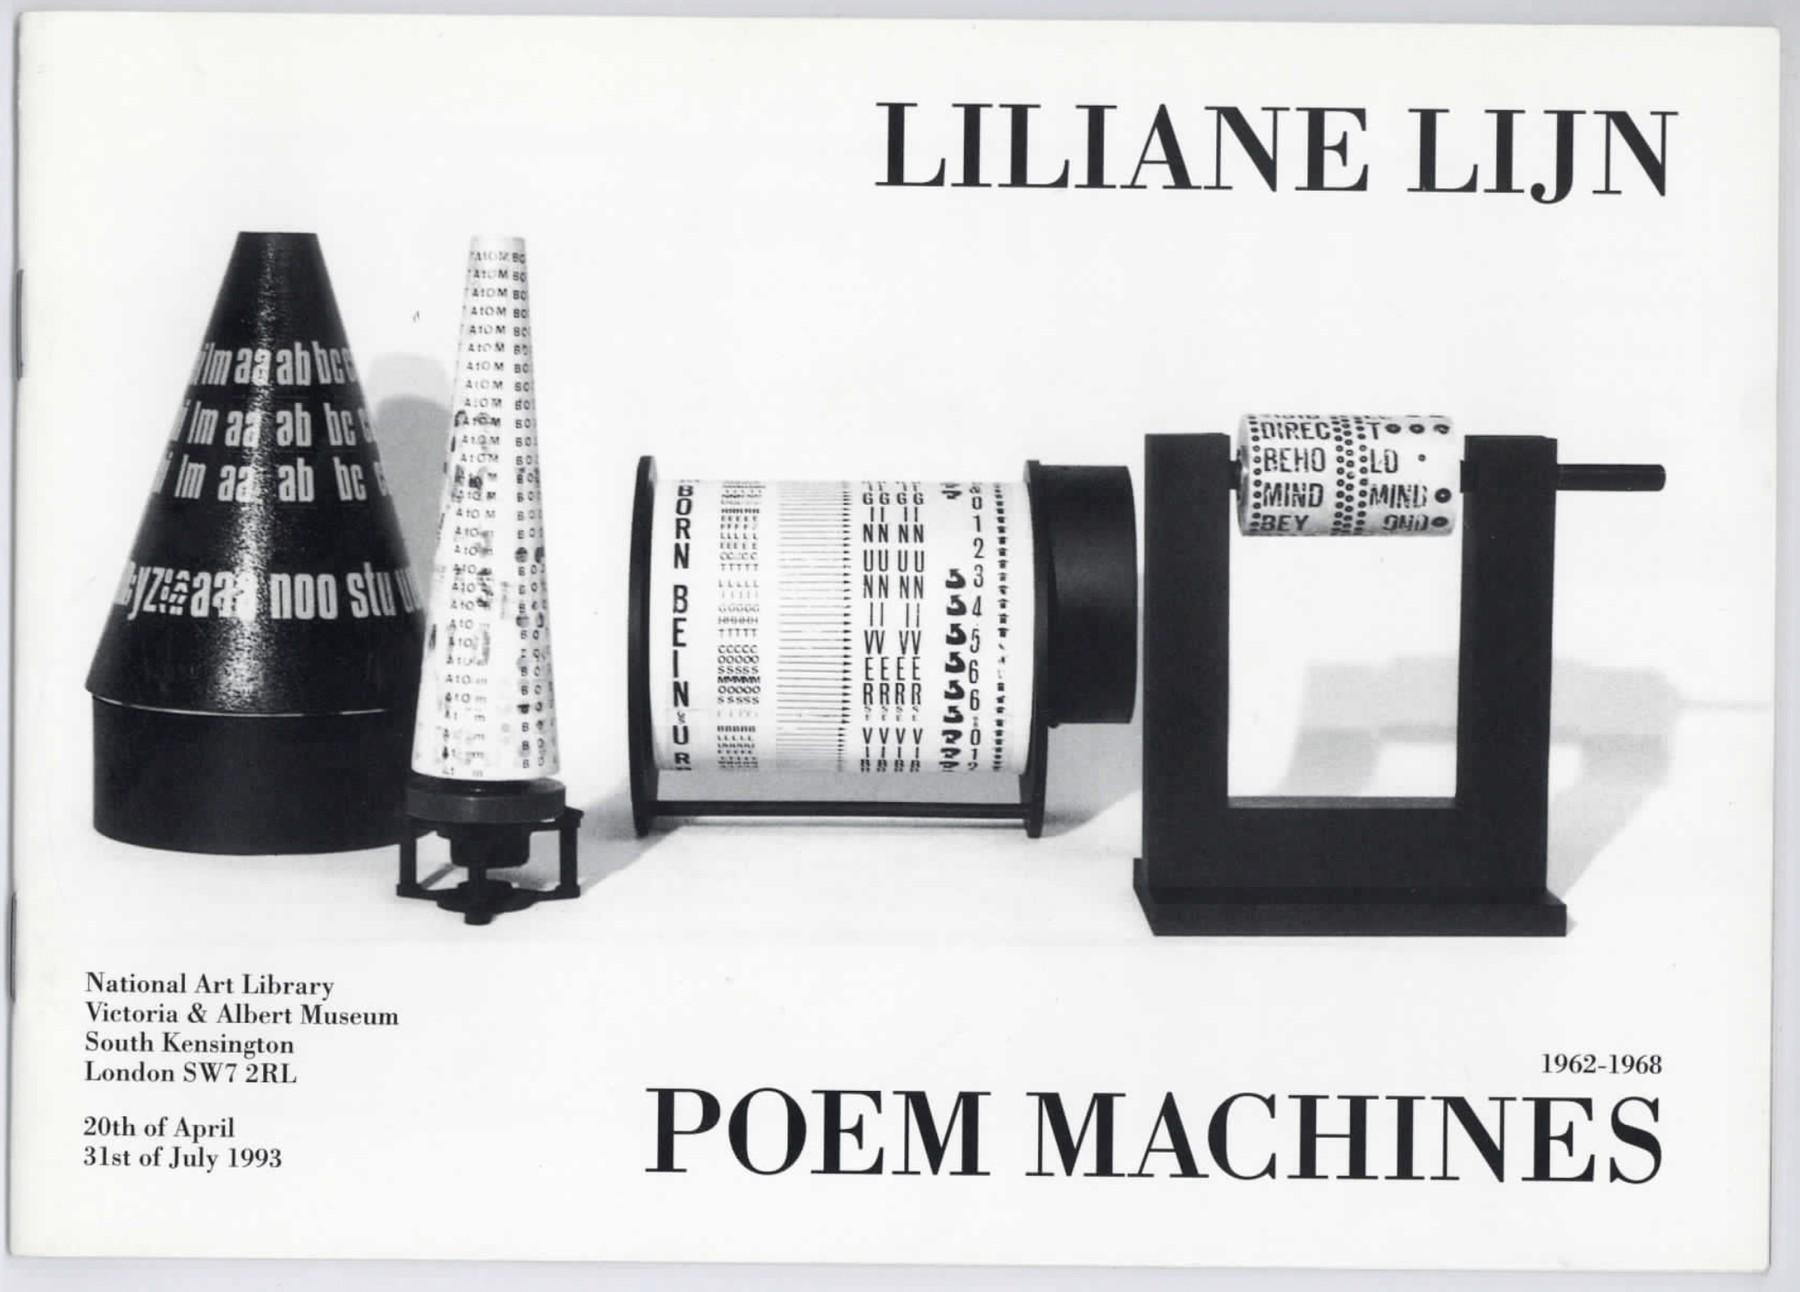 Poem Machines - Liliane Lijn